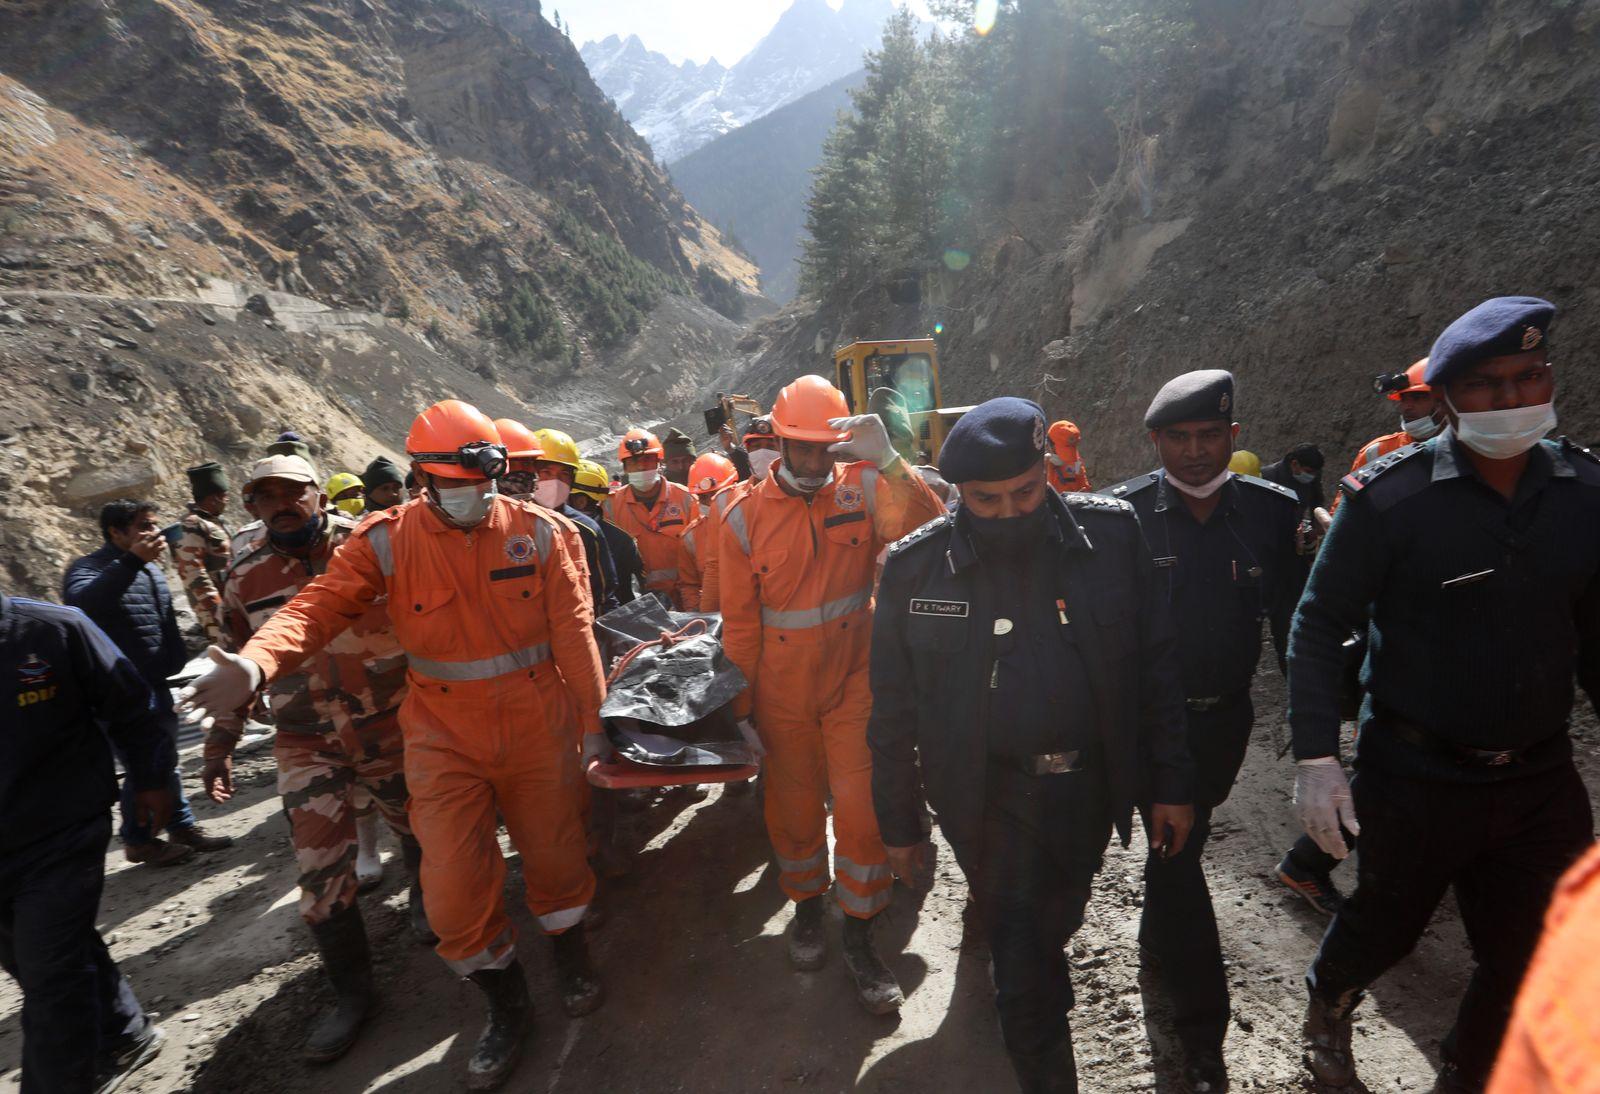 Glacier burst aftermath in Uttarakhand, India, Chamoli - 09 Feb 2021